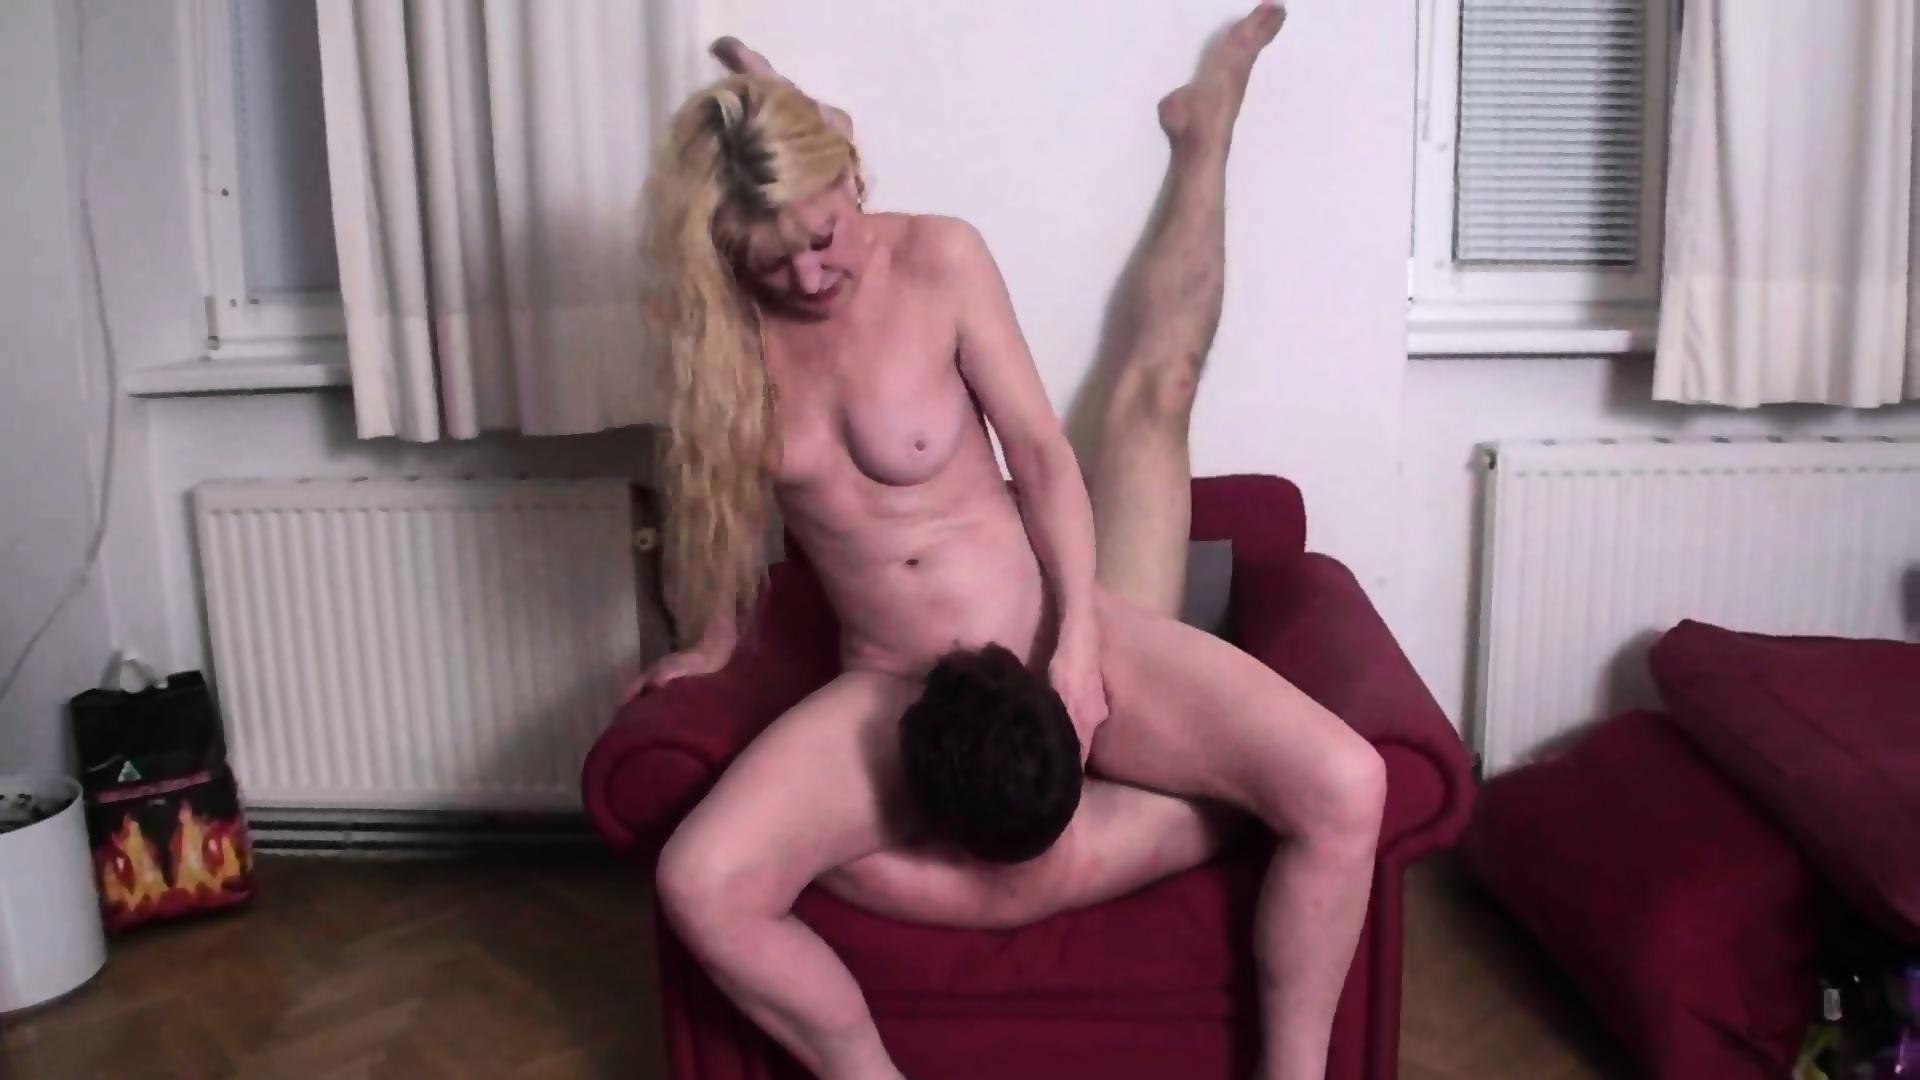 Cherry lane porn star